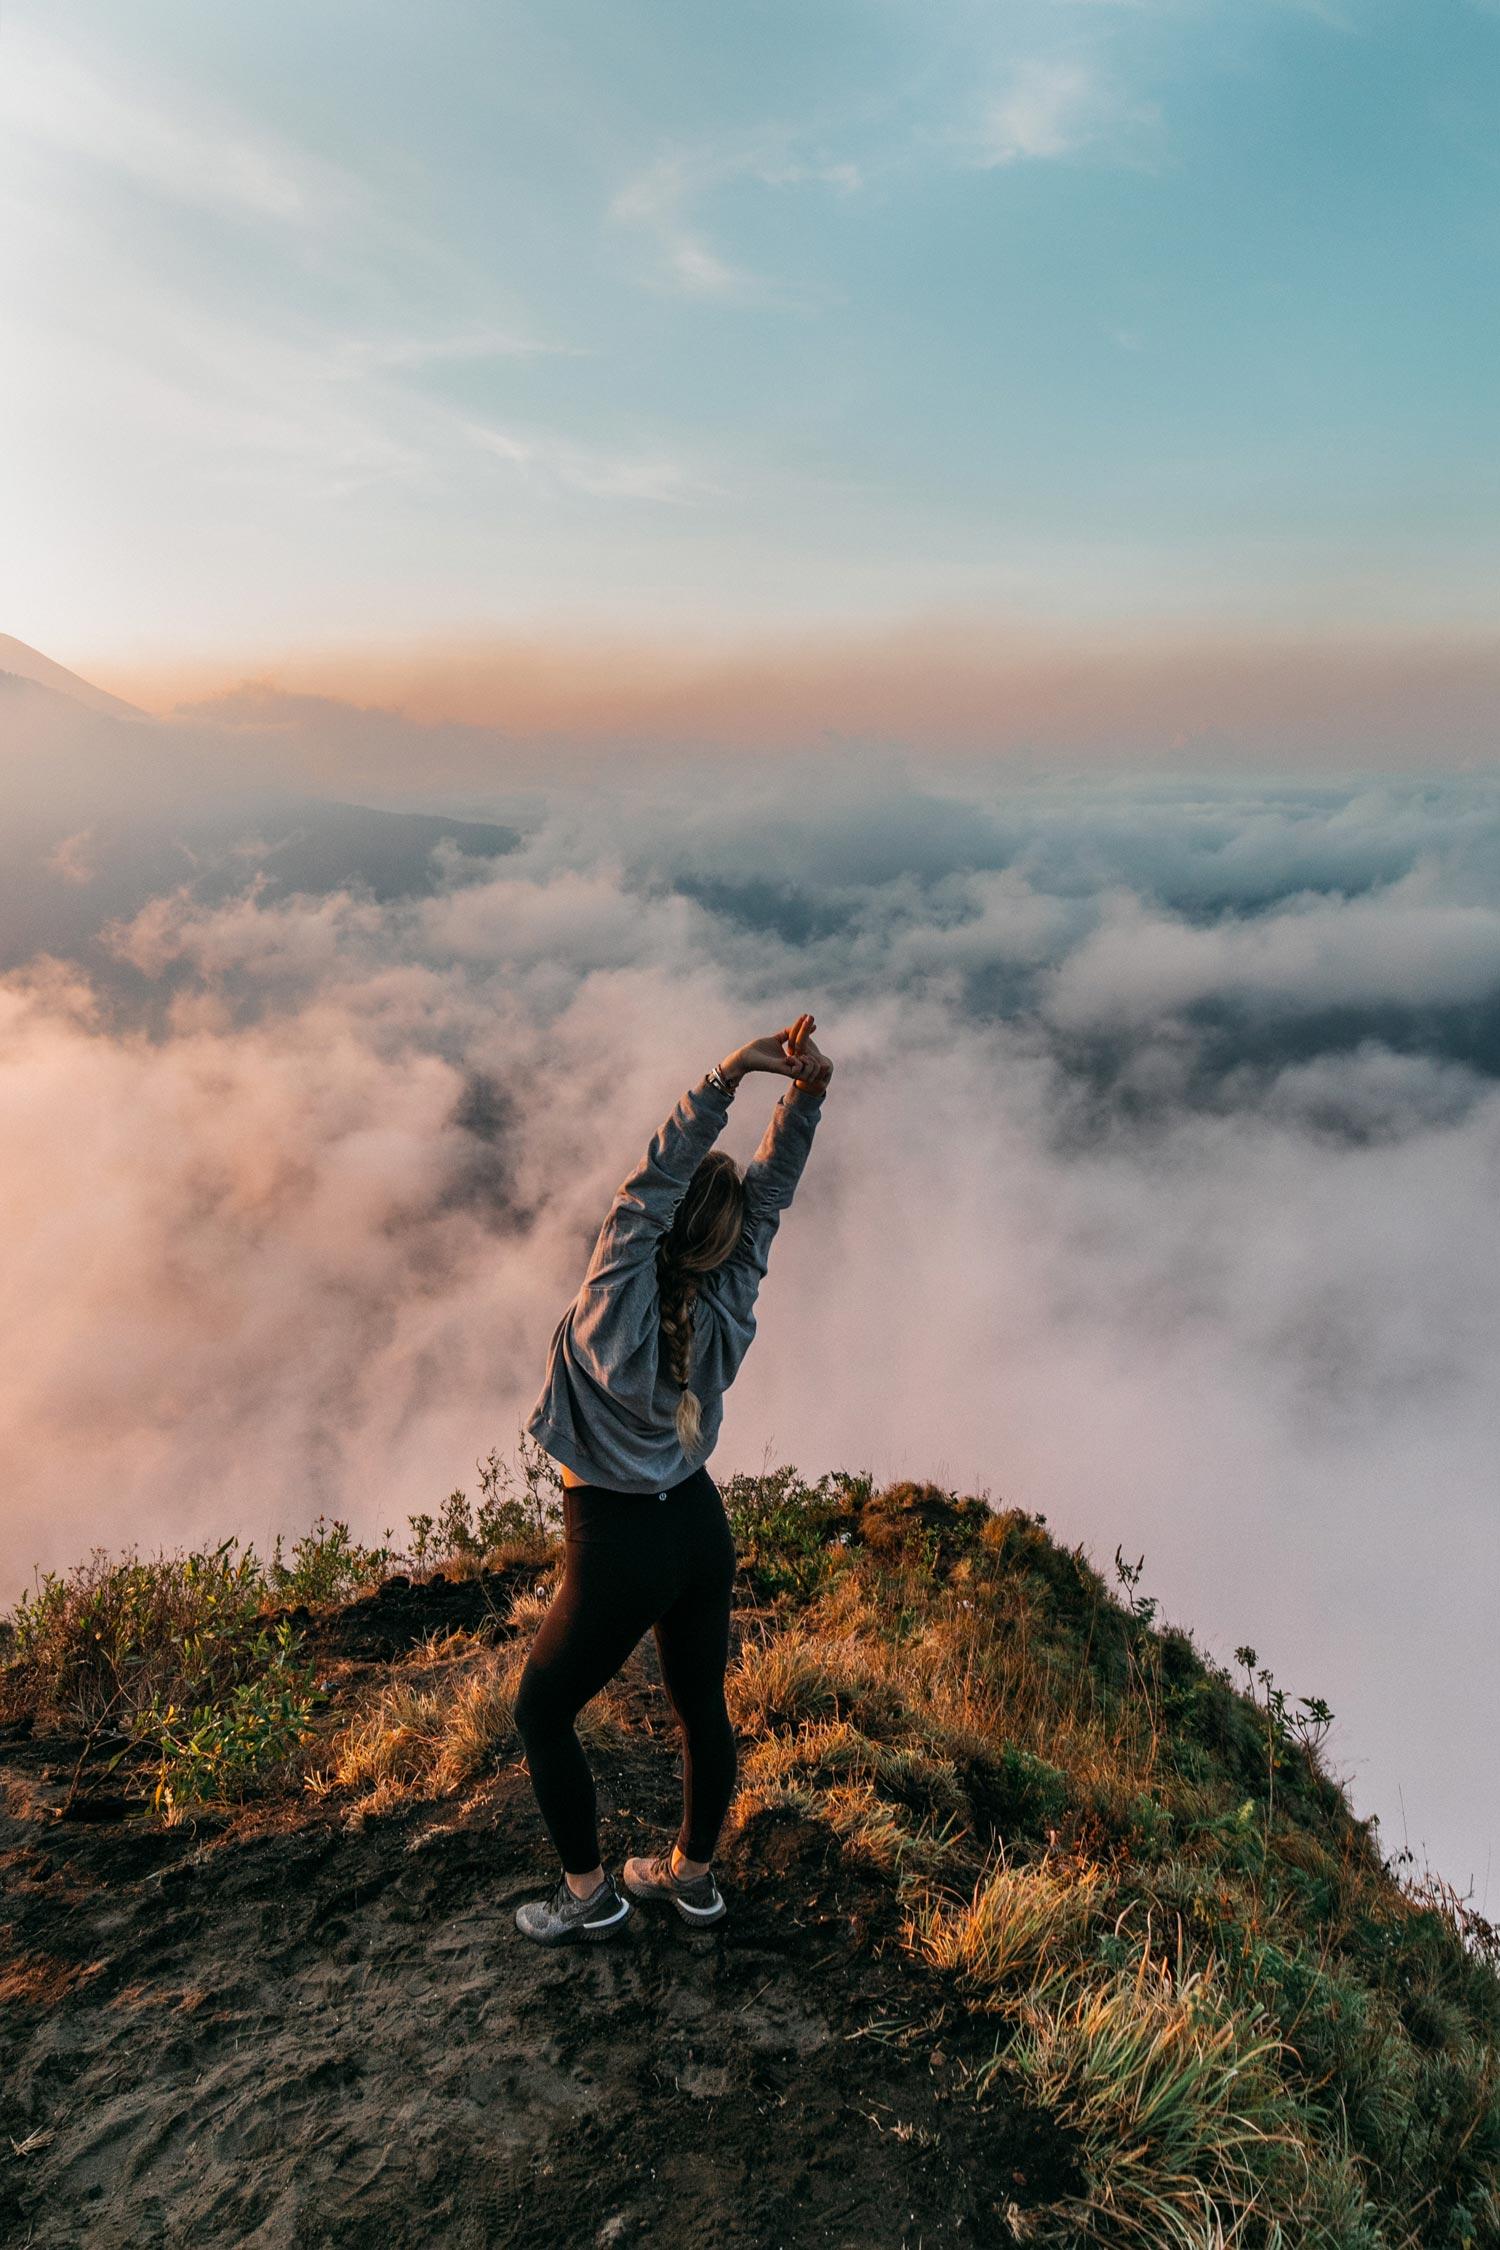 bali-indonesia-yoga-retreat-travel-photography-15.jpg